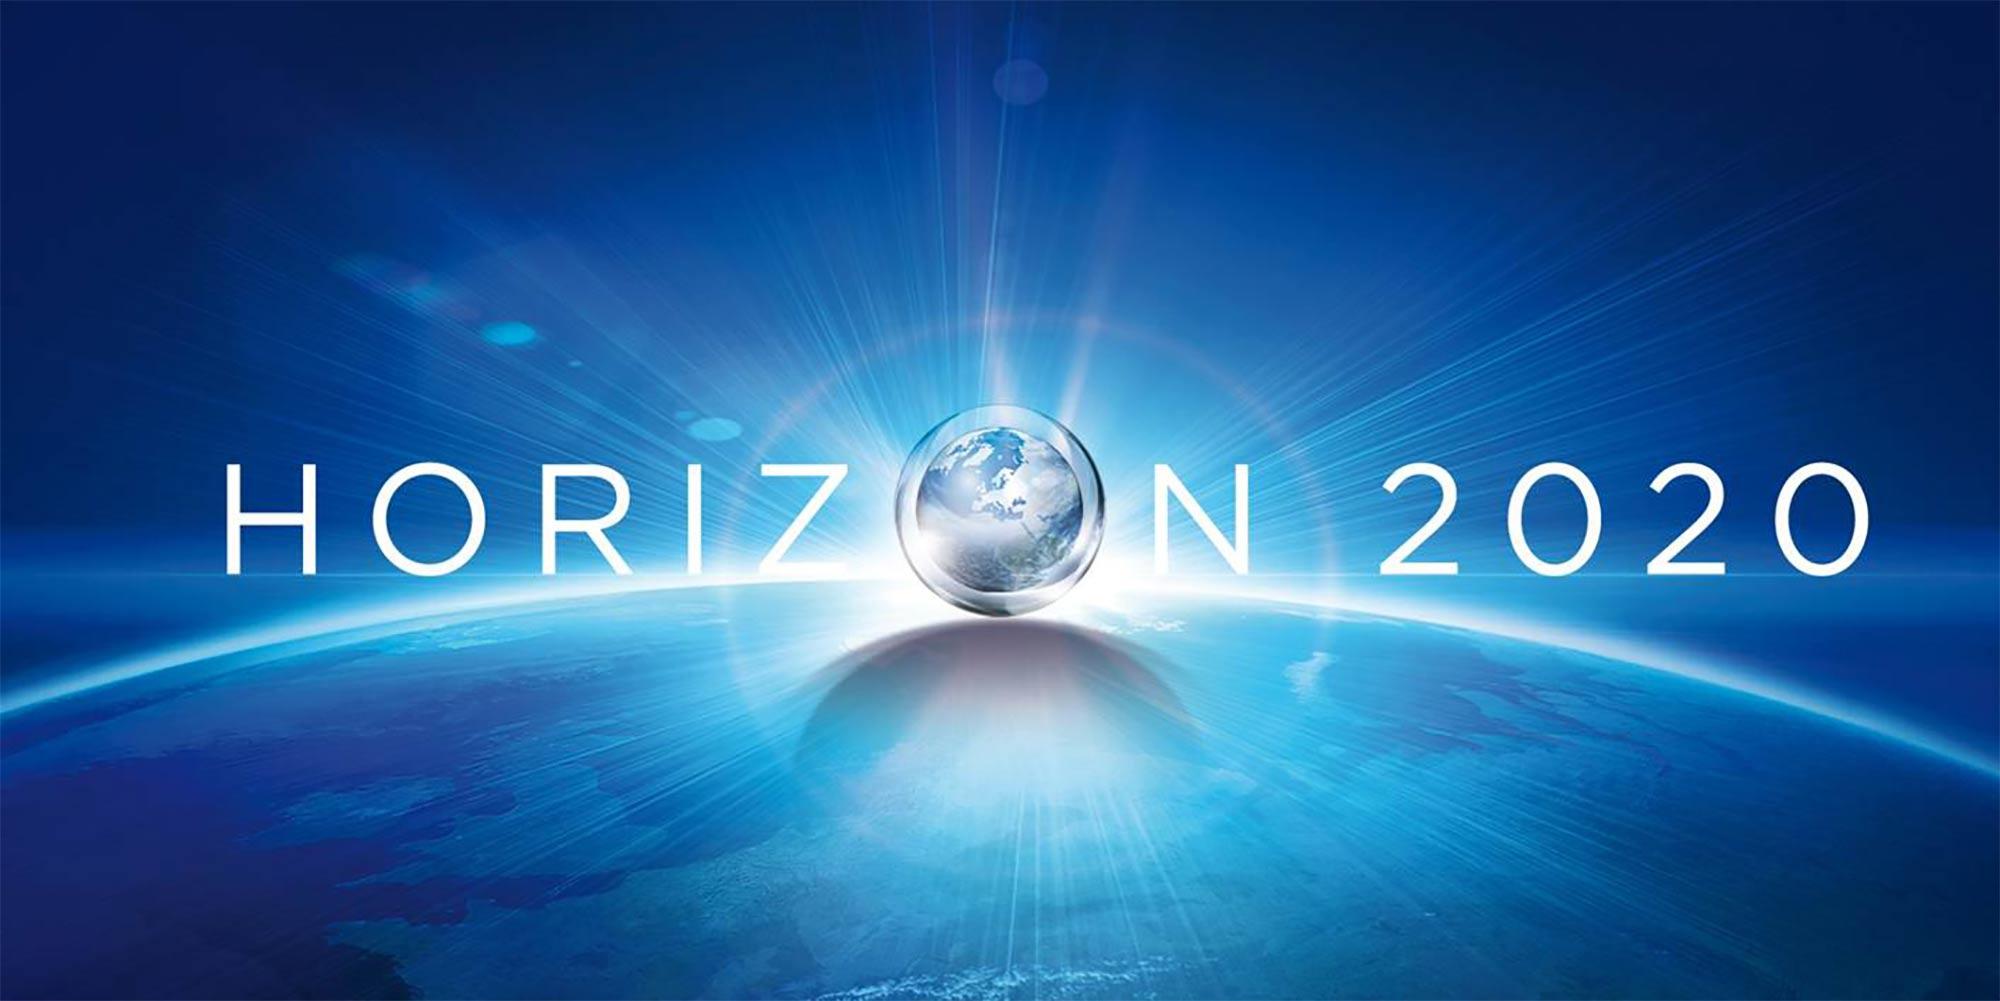 Last updates on Horizon2020 calls